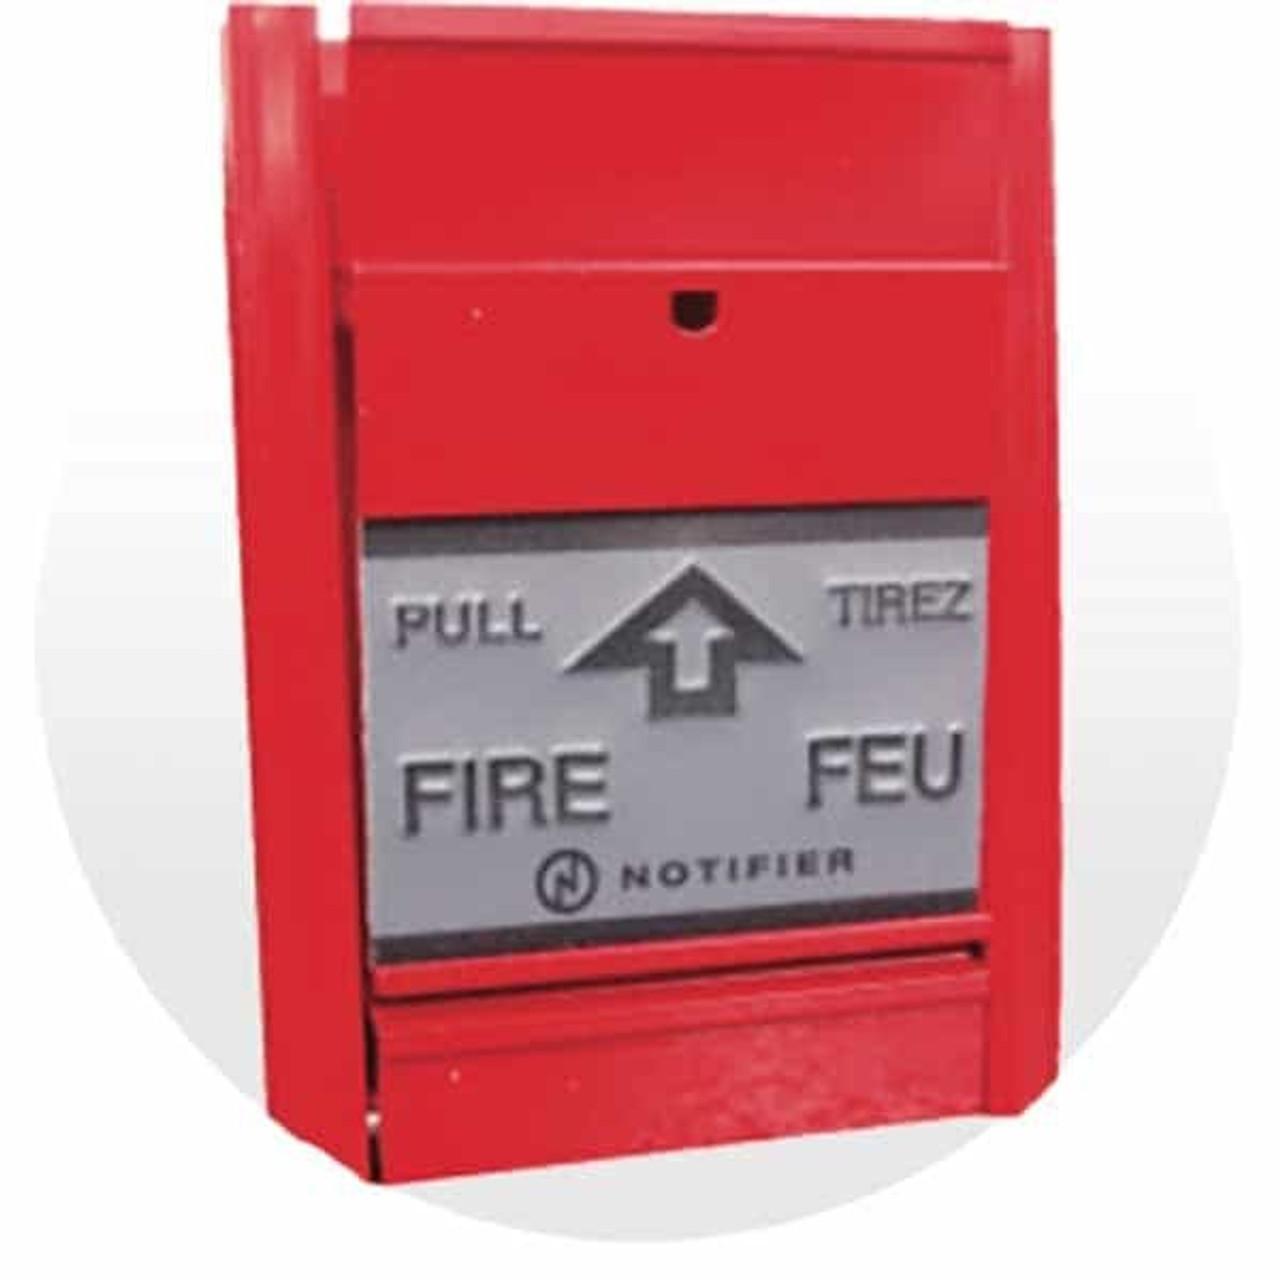 Fire Alarm Parts & Accessories